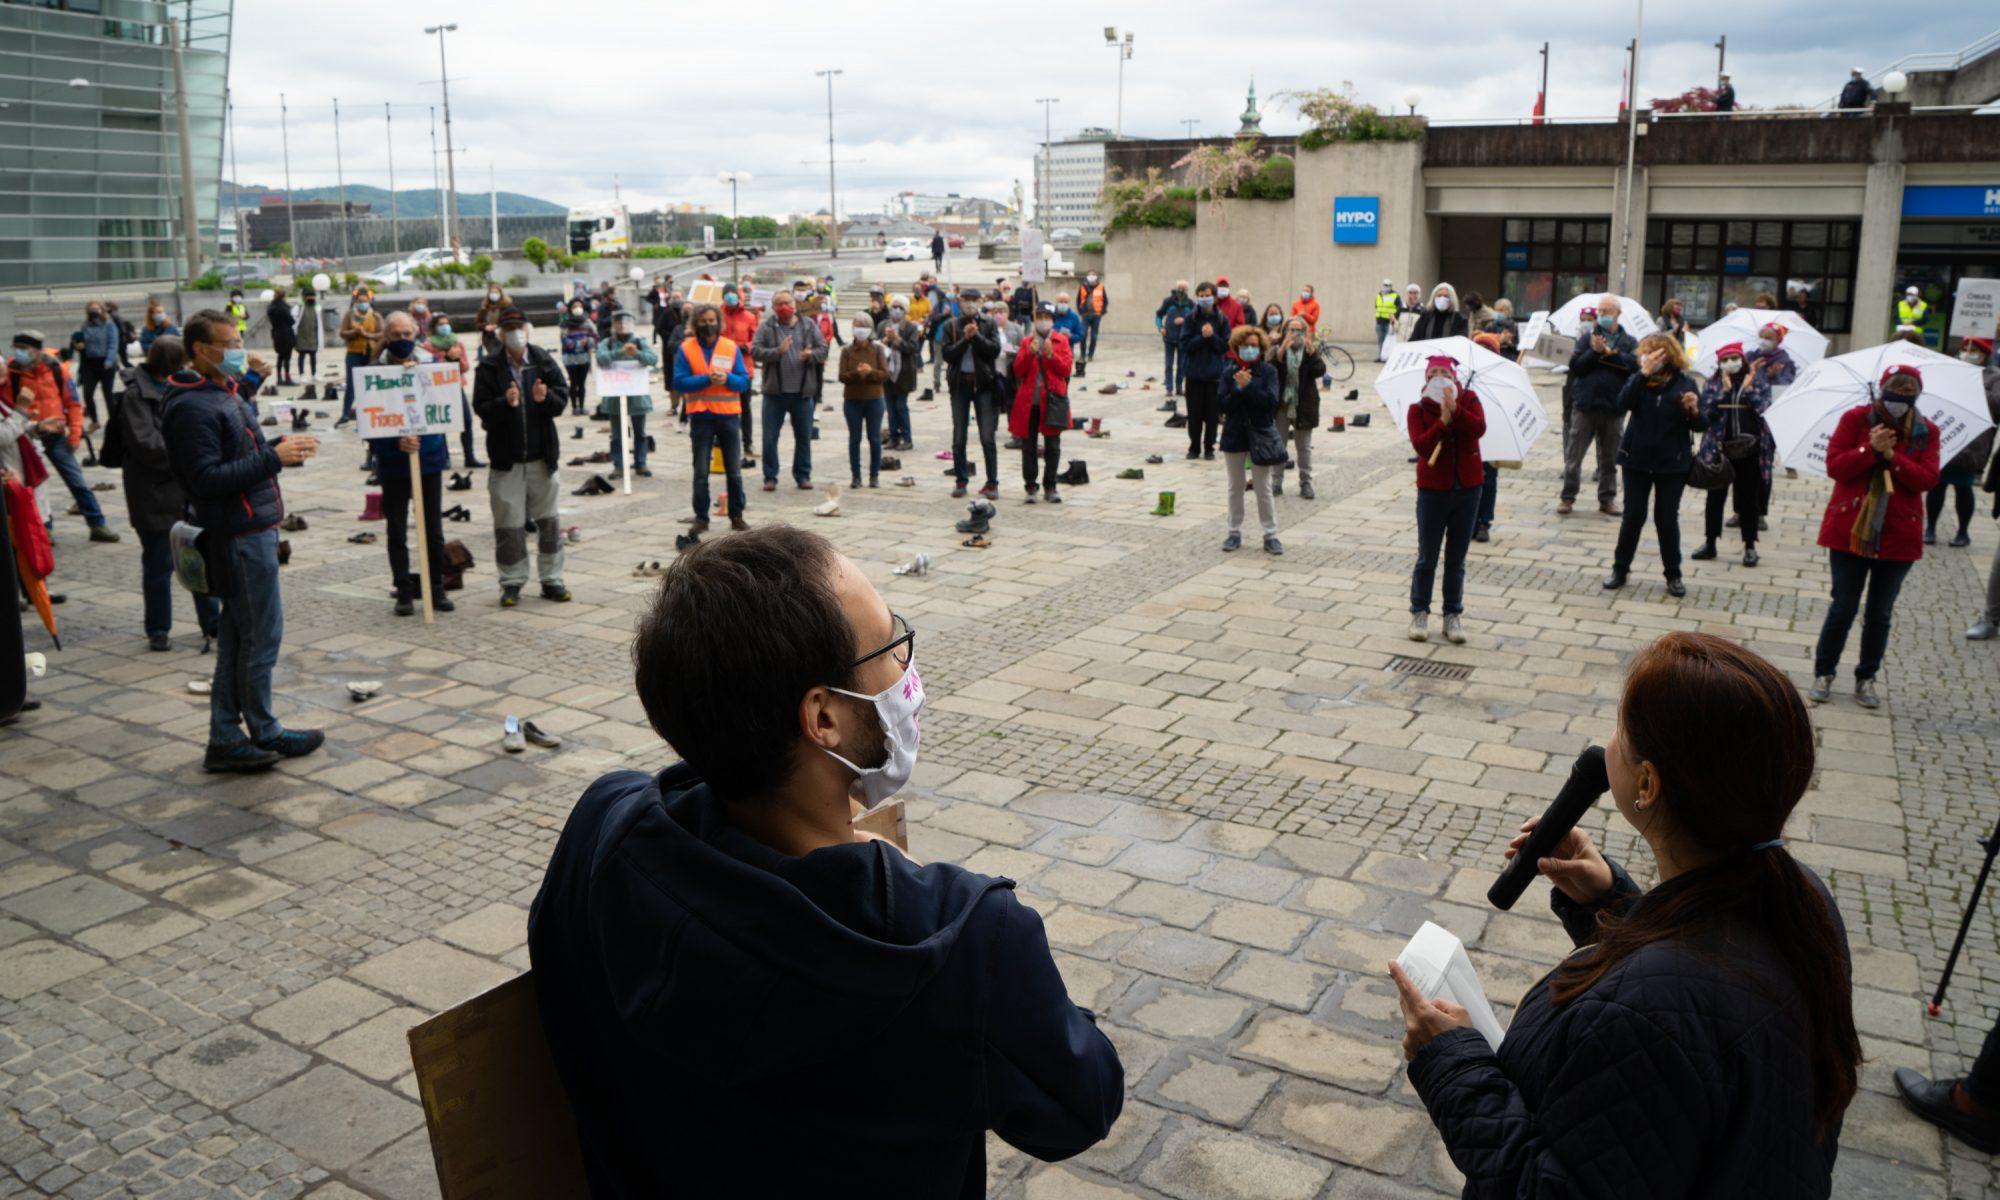 Umbrella March Linz - Plattform Solidarität